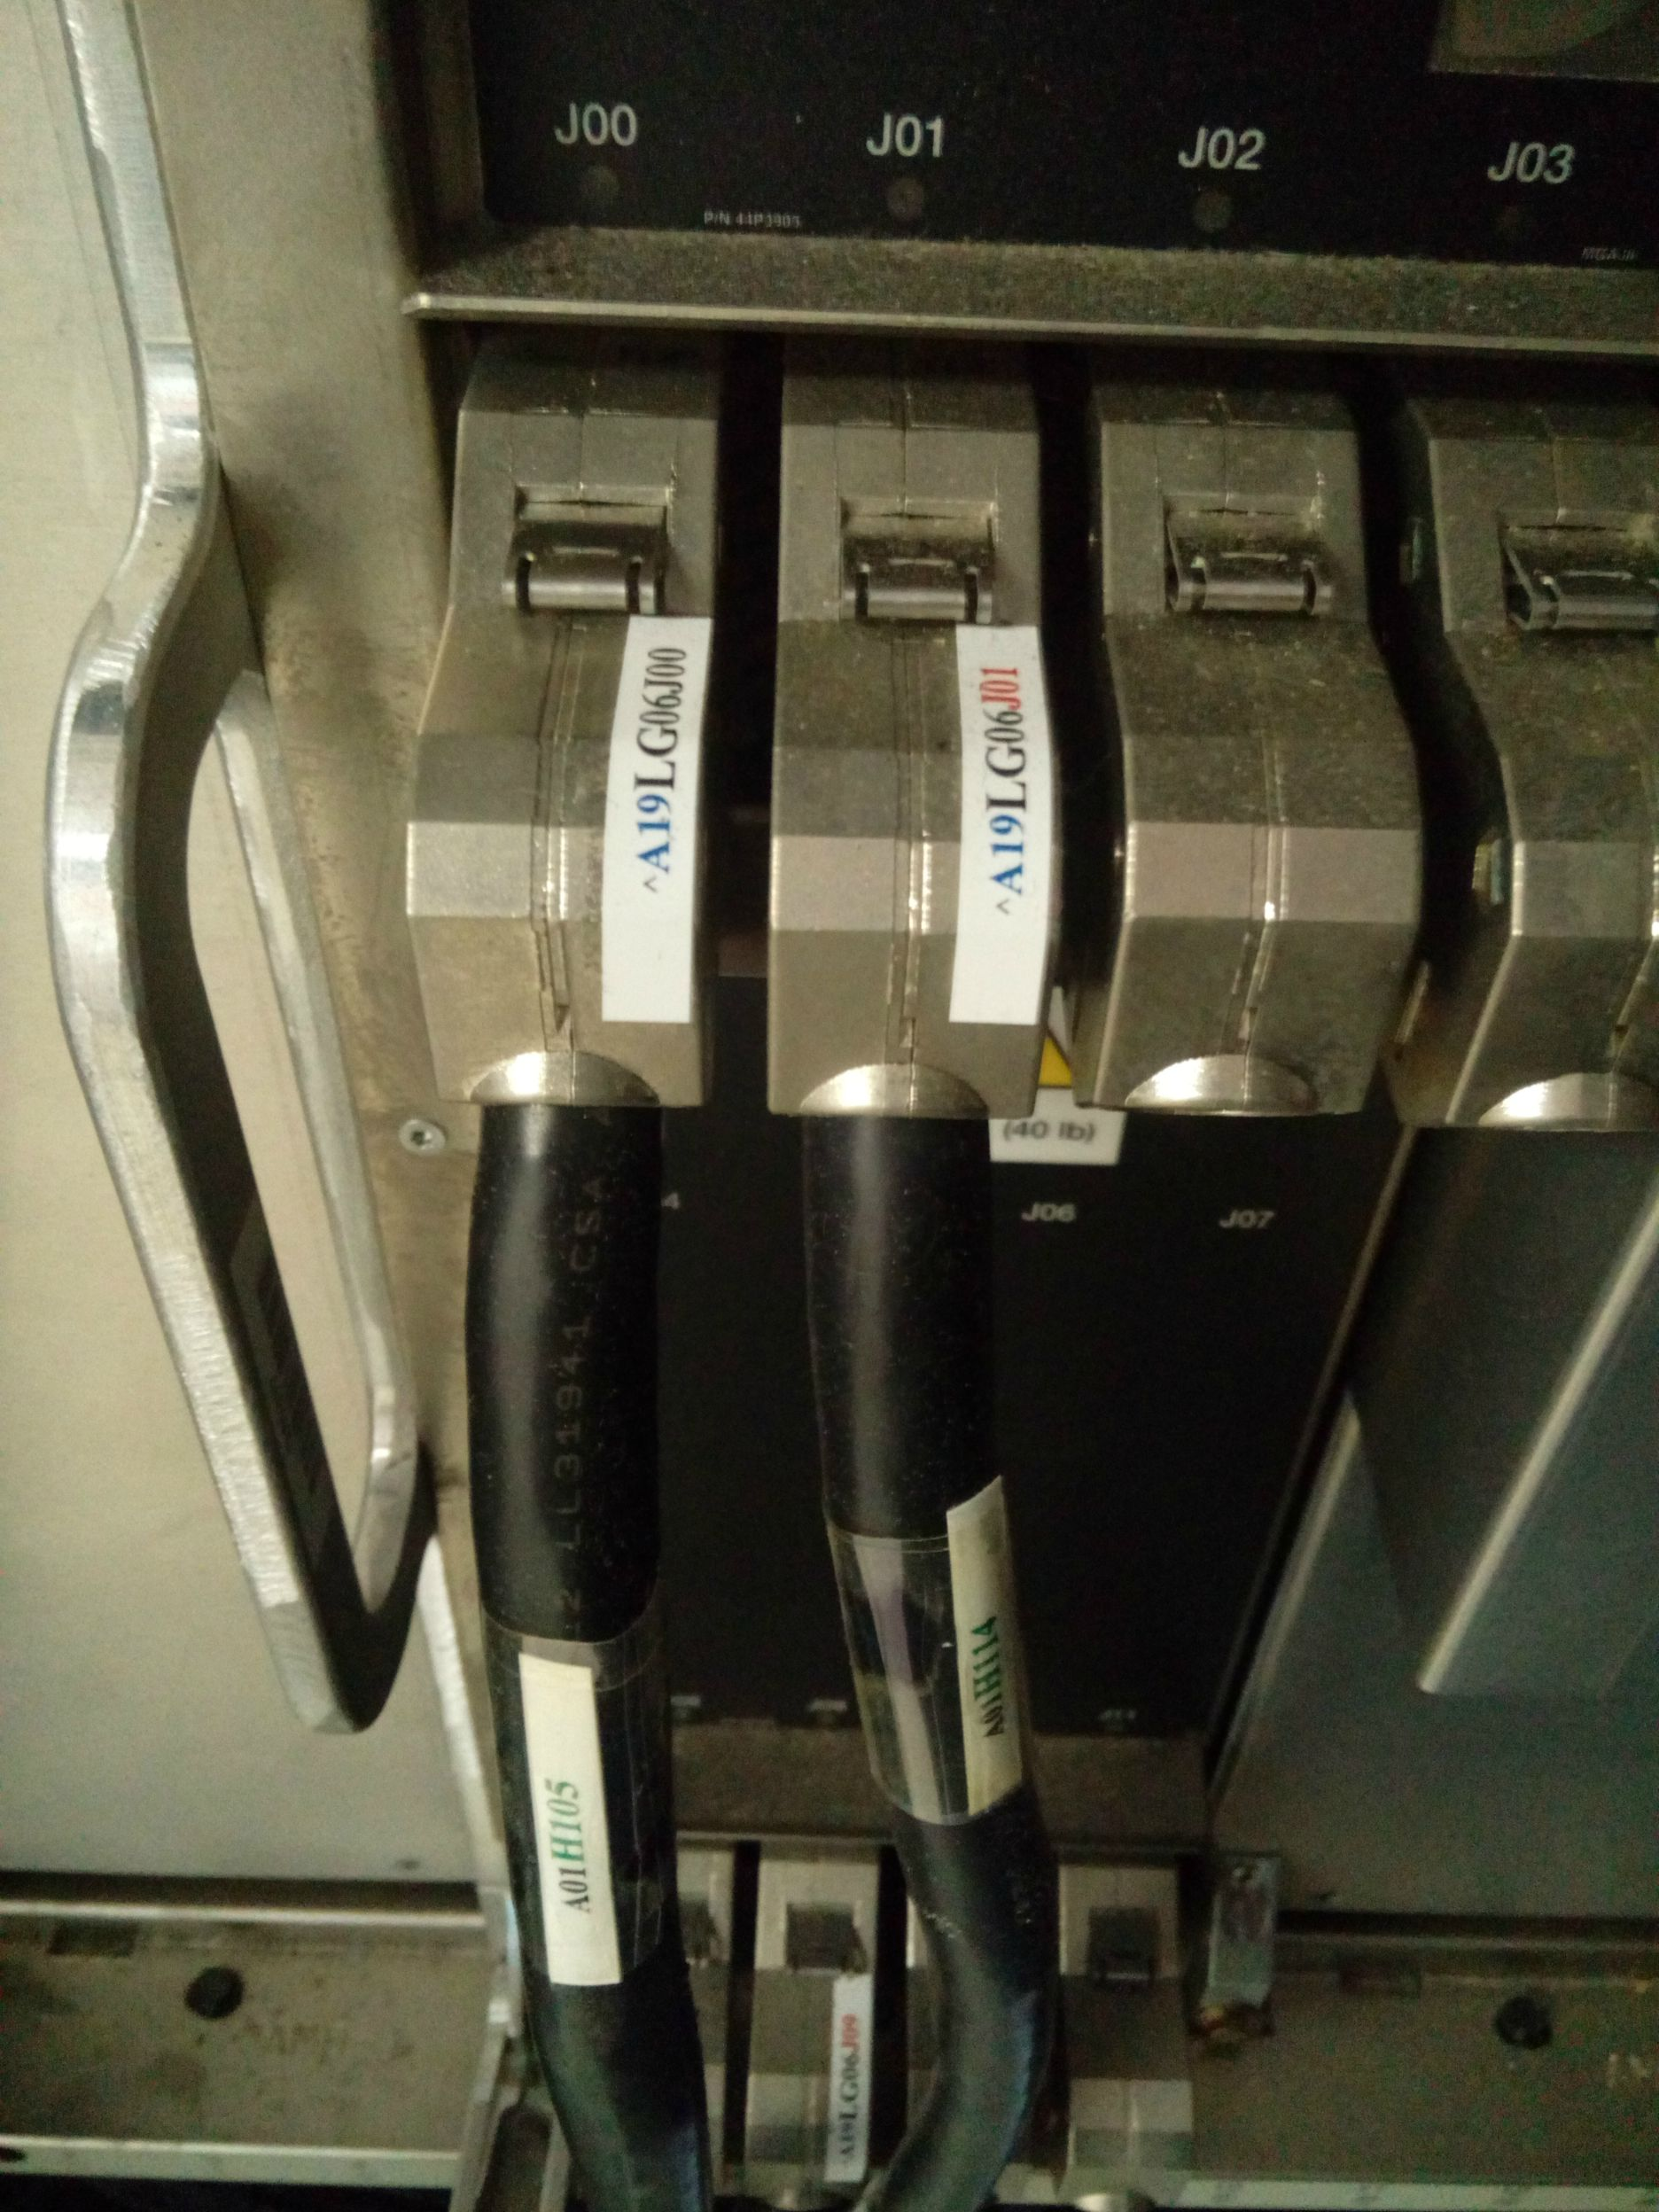 18-летний энтузиаст купил и установил в подвале мейнфрейм IBM z890 (2004 год) - 4